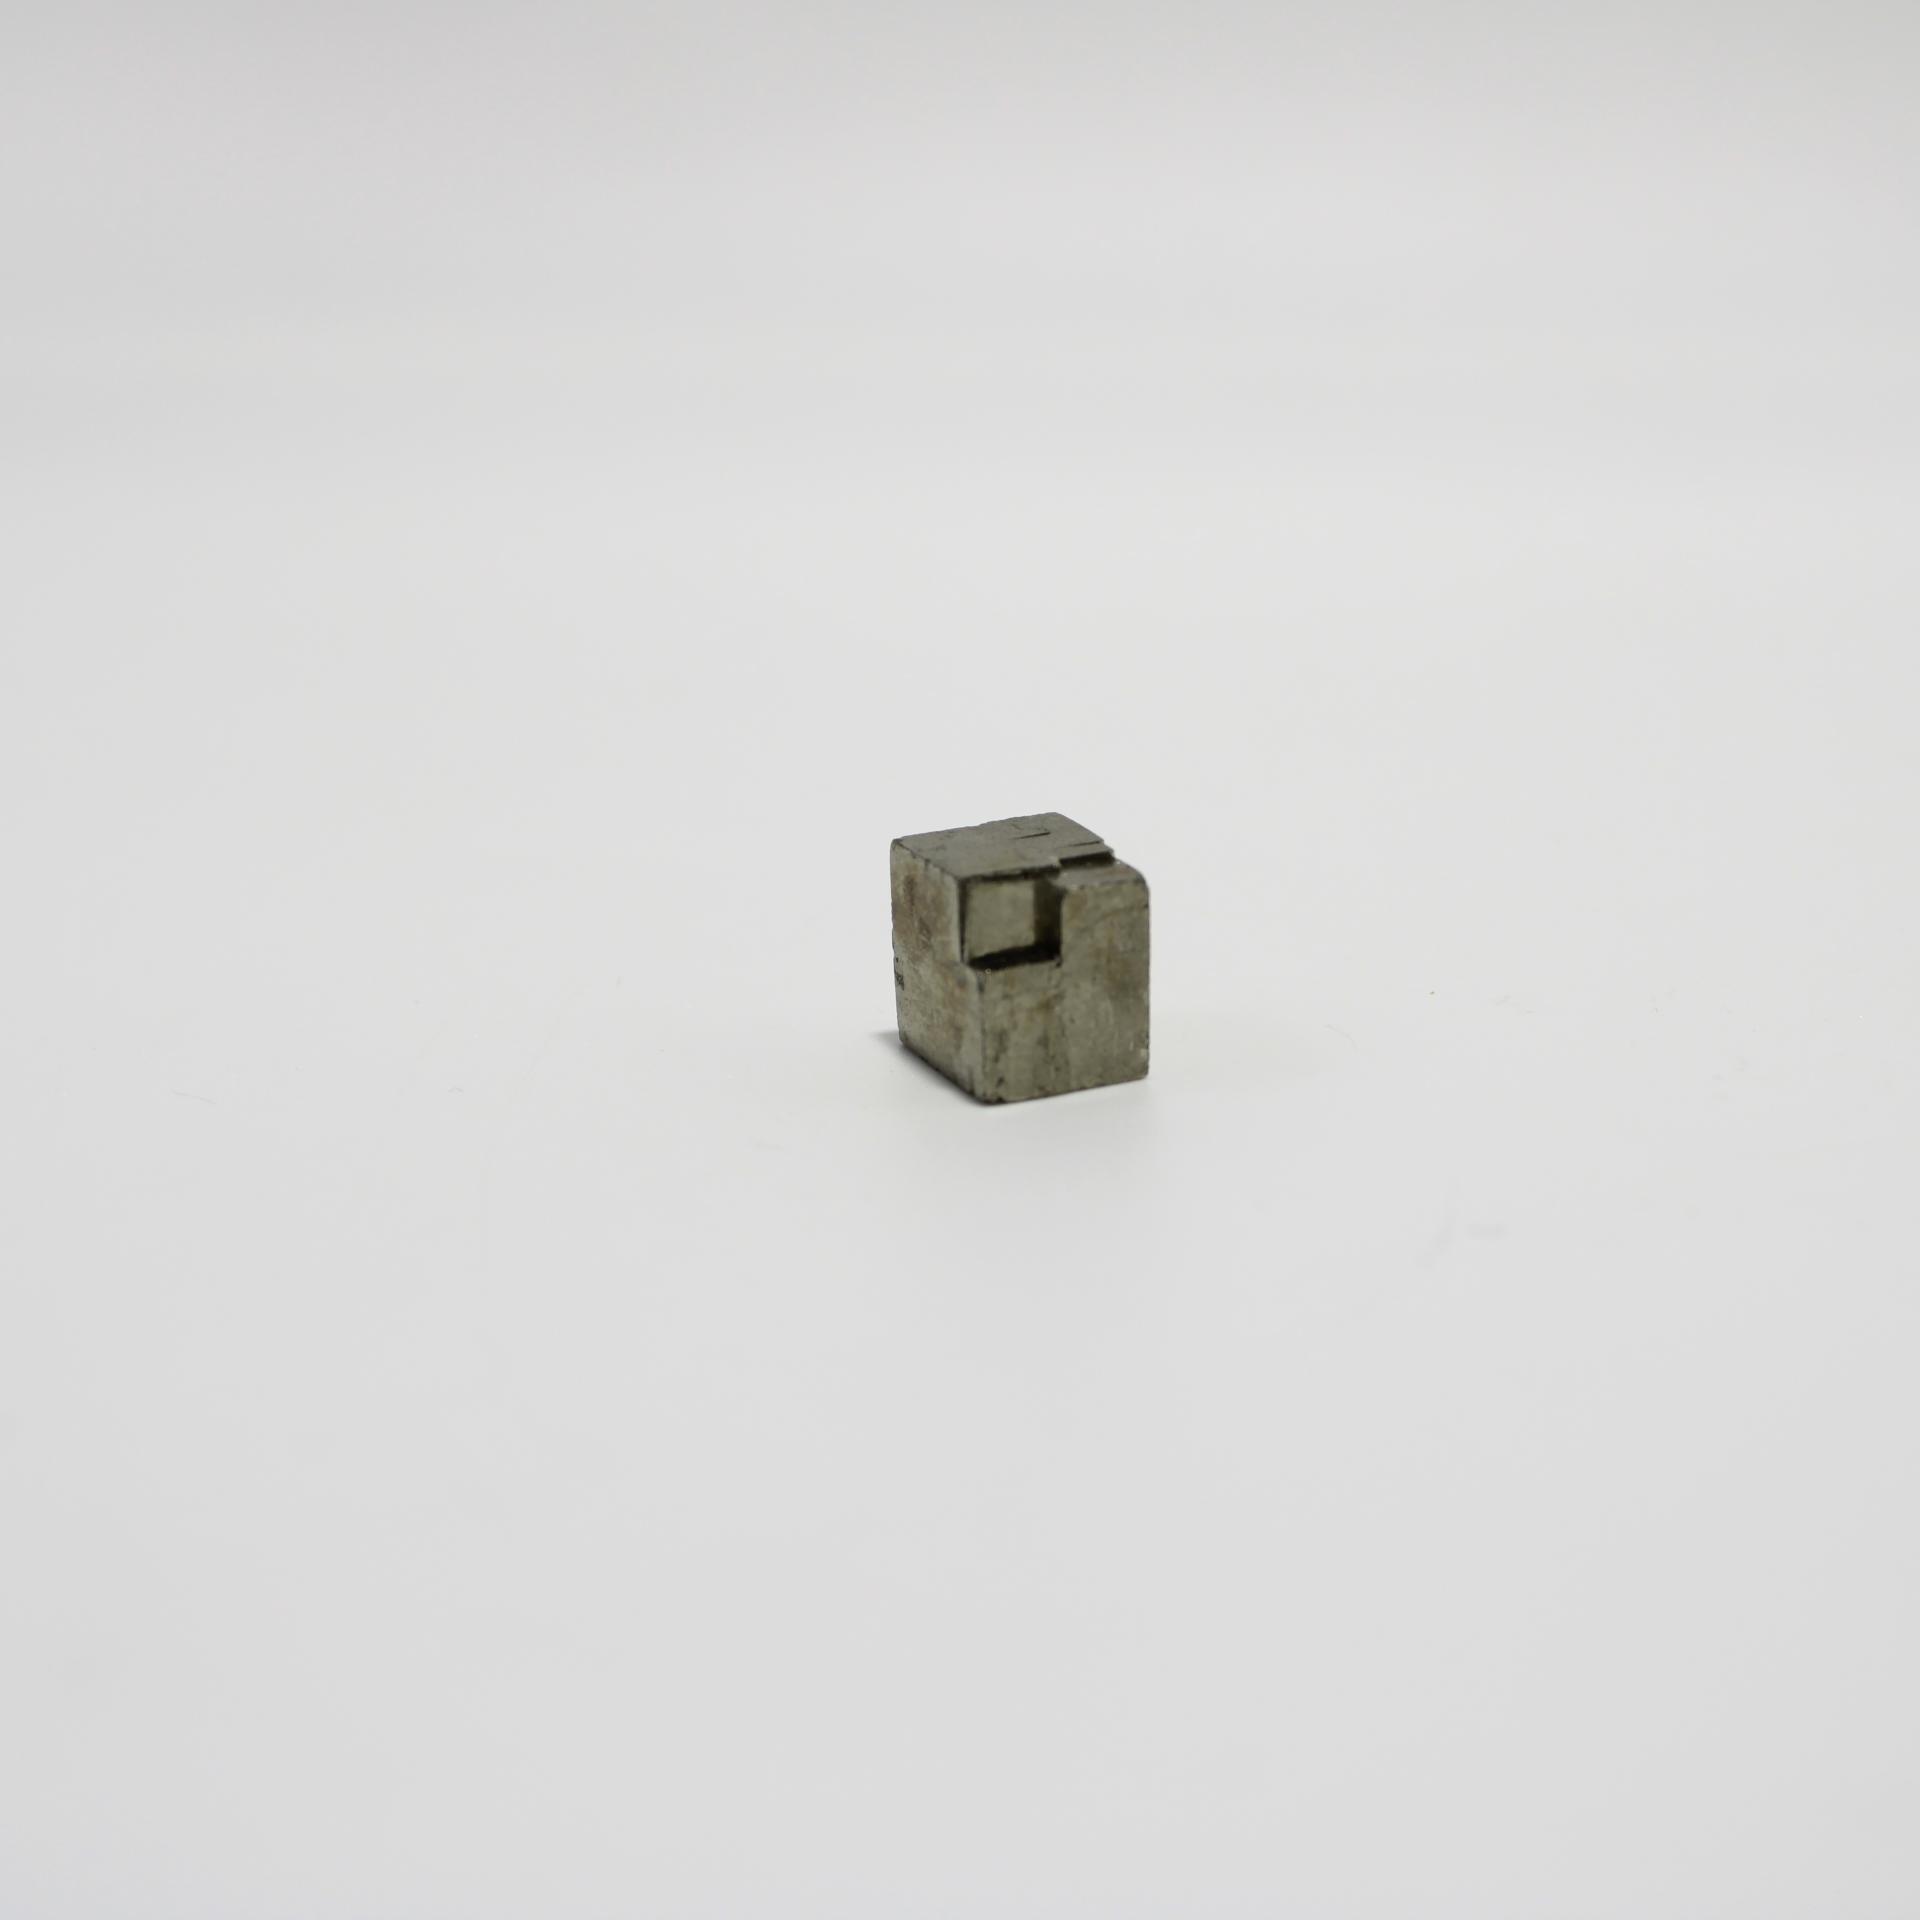 I70 pyritecube 1